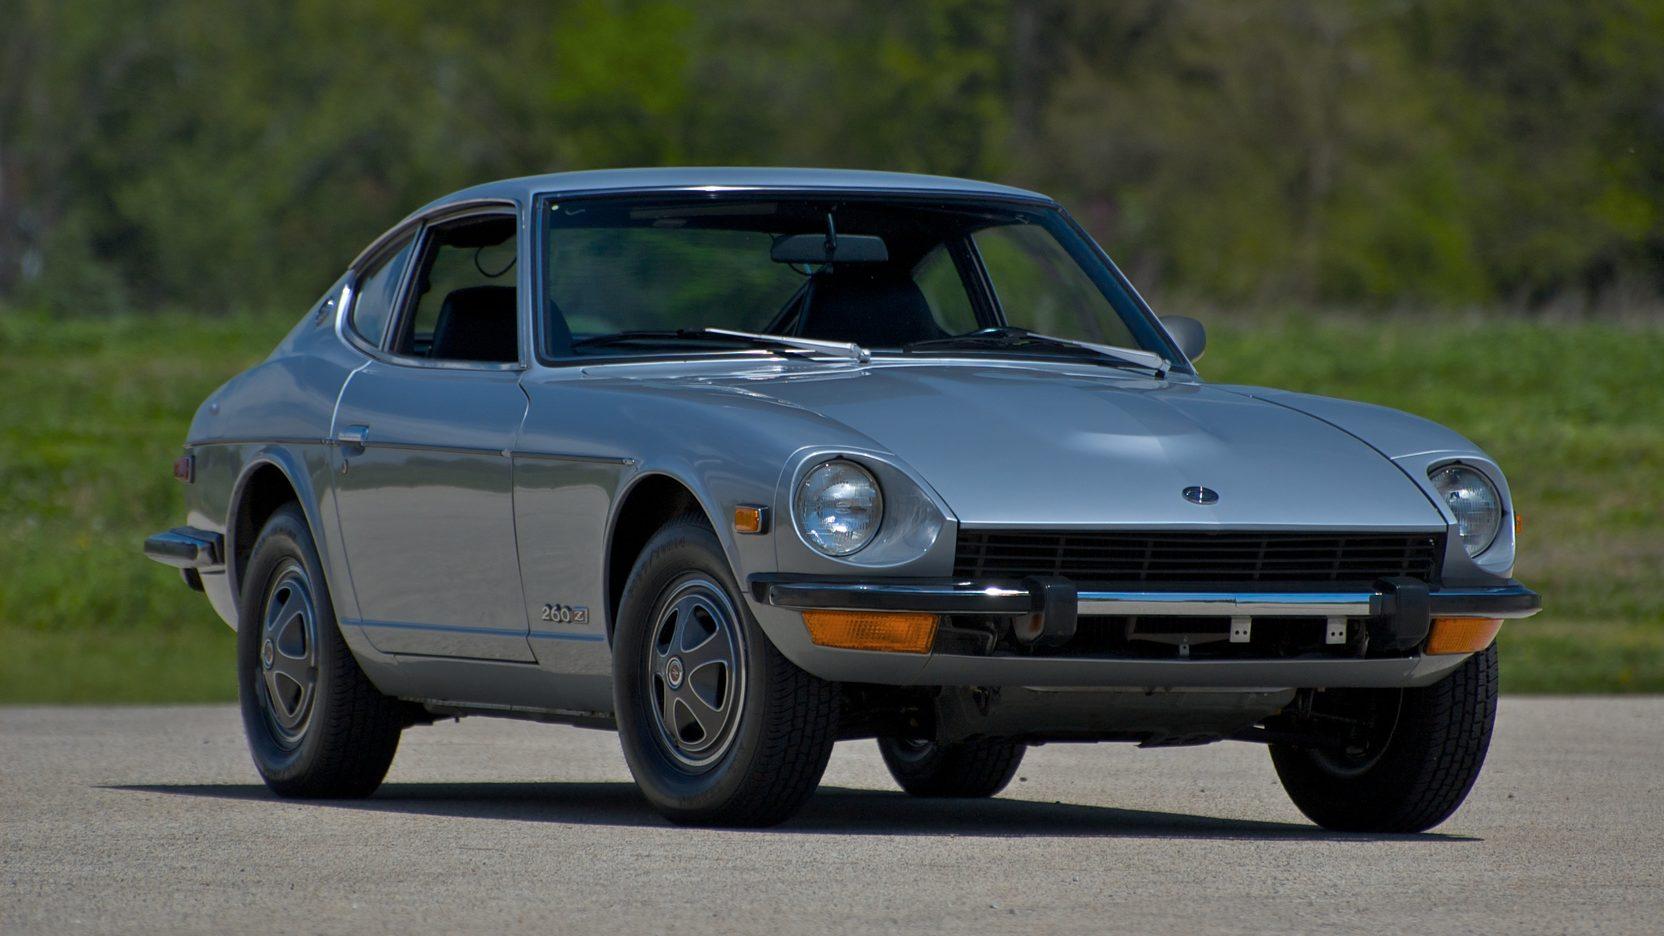 1974 Datsun 260Z coupe